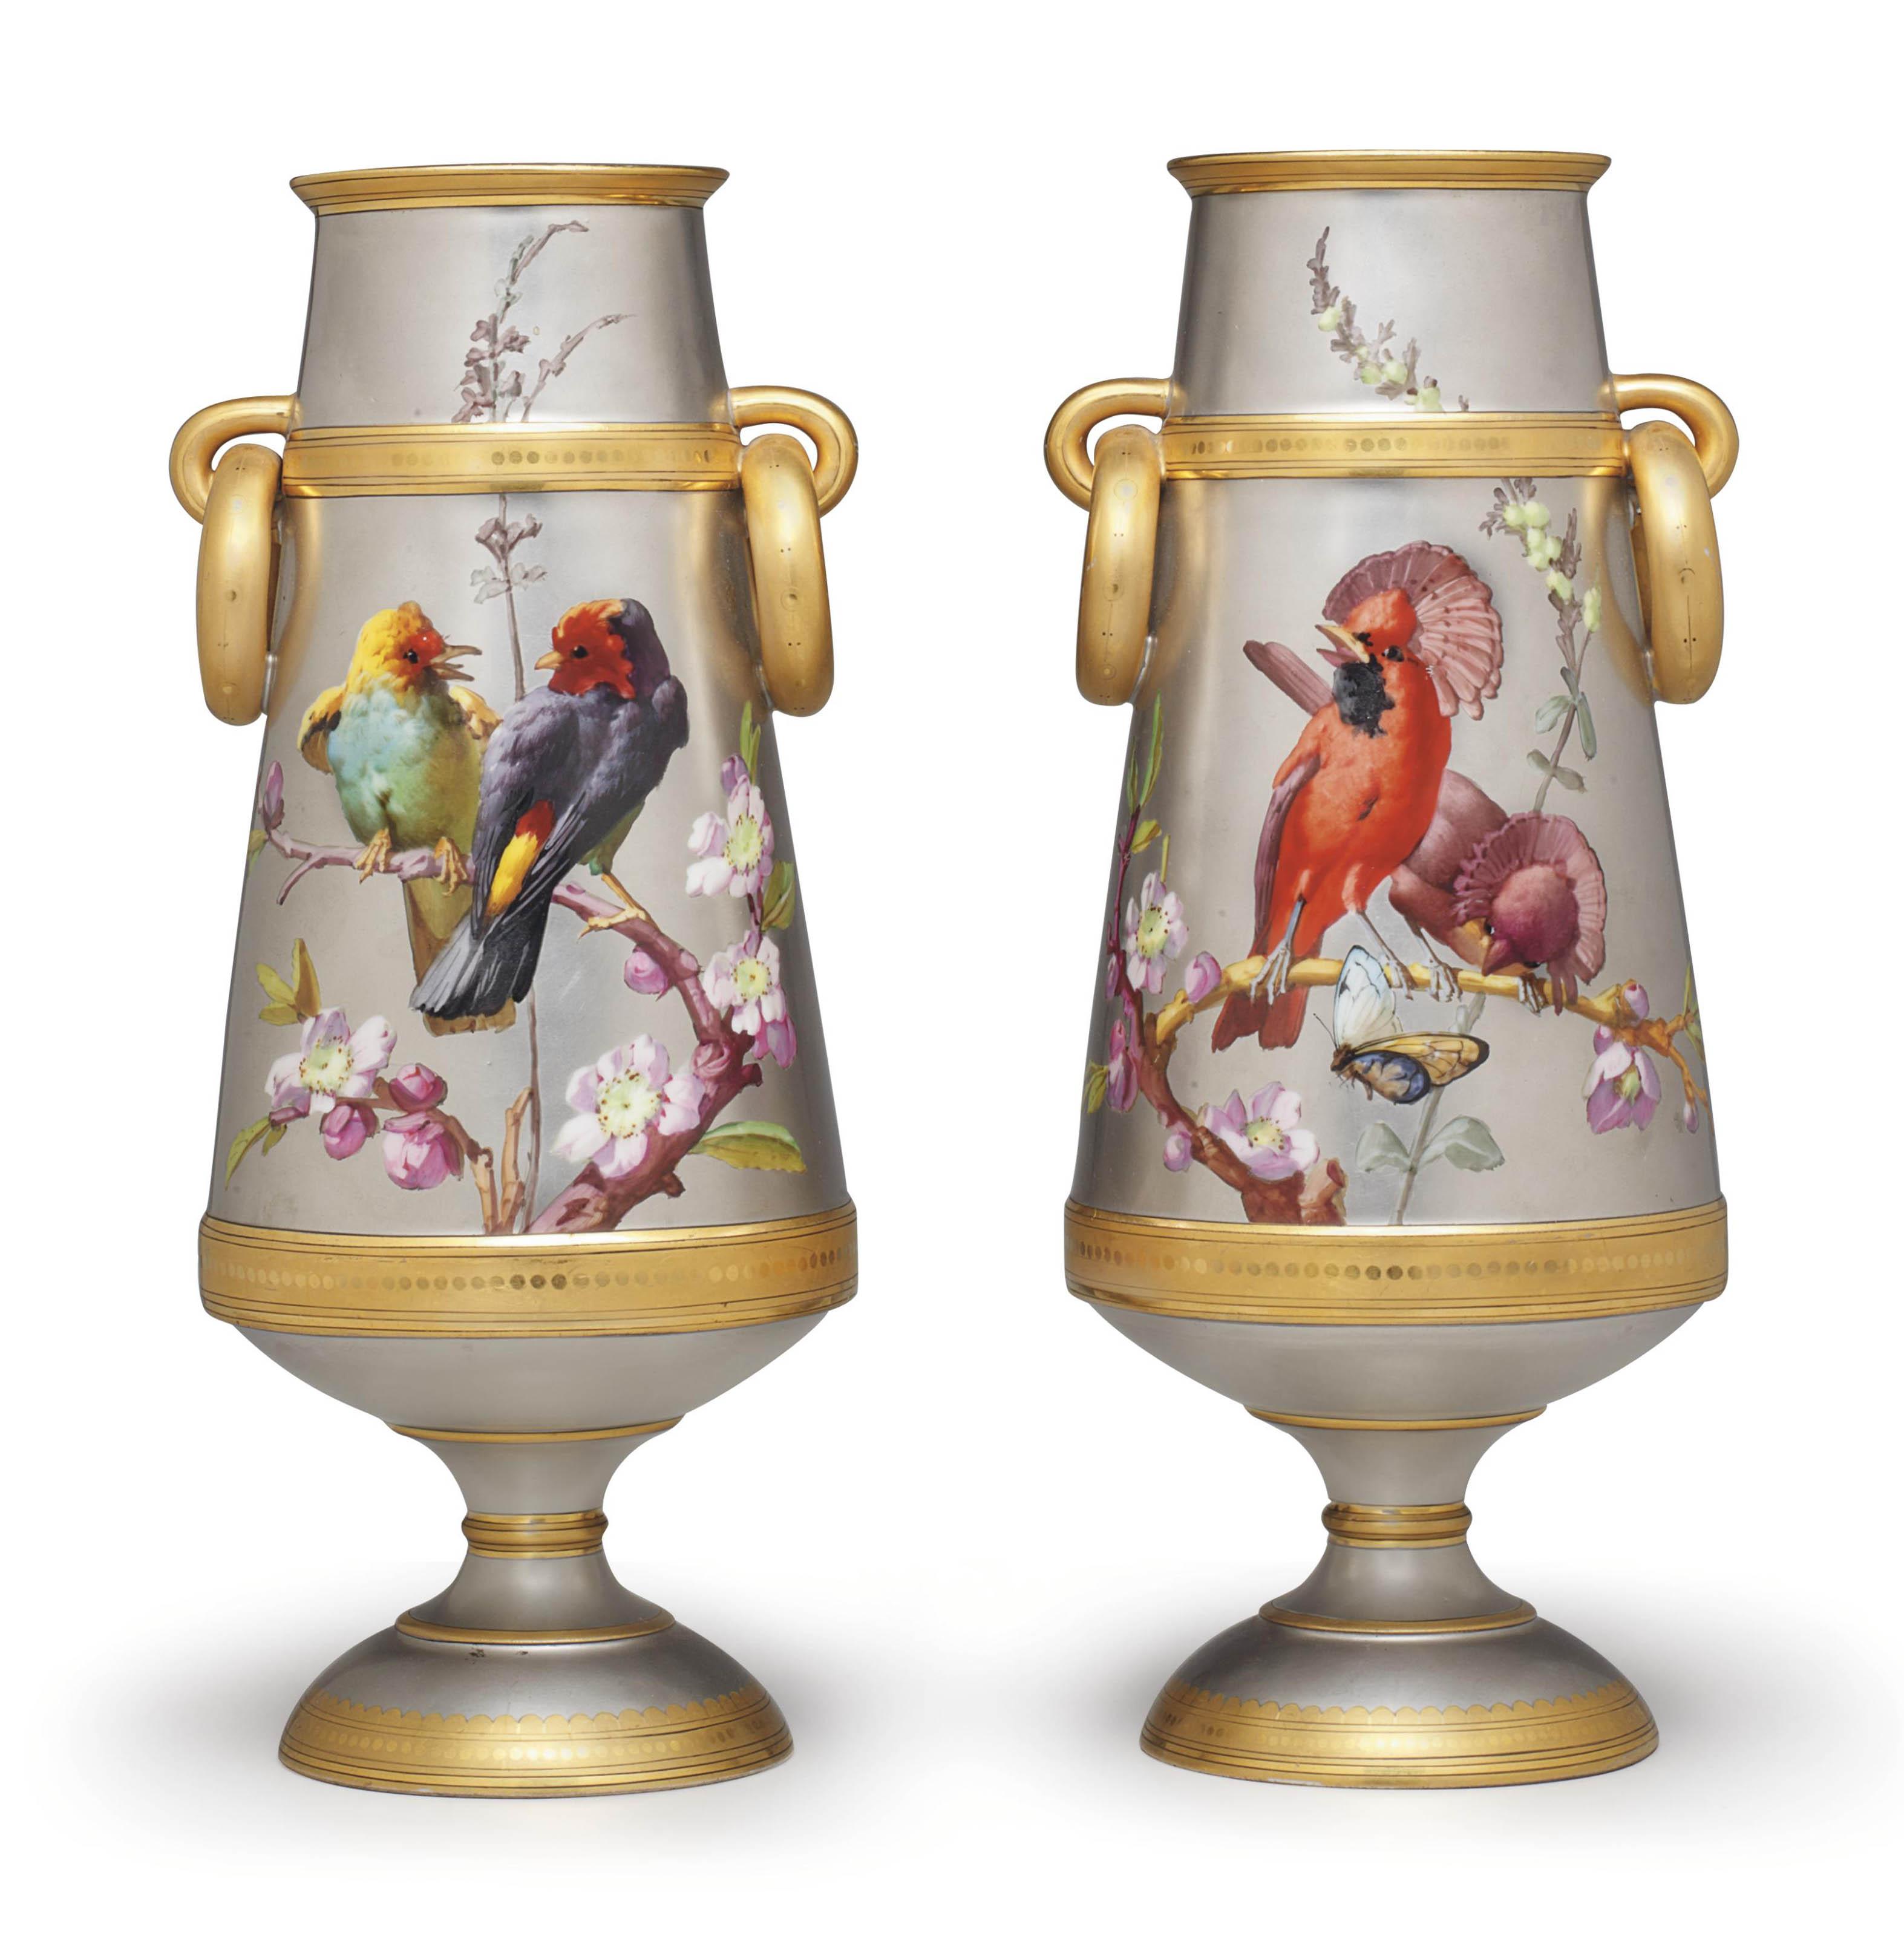 A PAIR OF PARIS EXHIBITION PLATINUM-GROUND TWO-HANDLED VASES